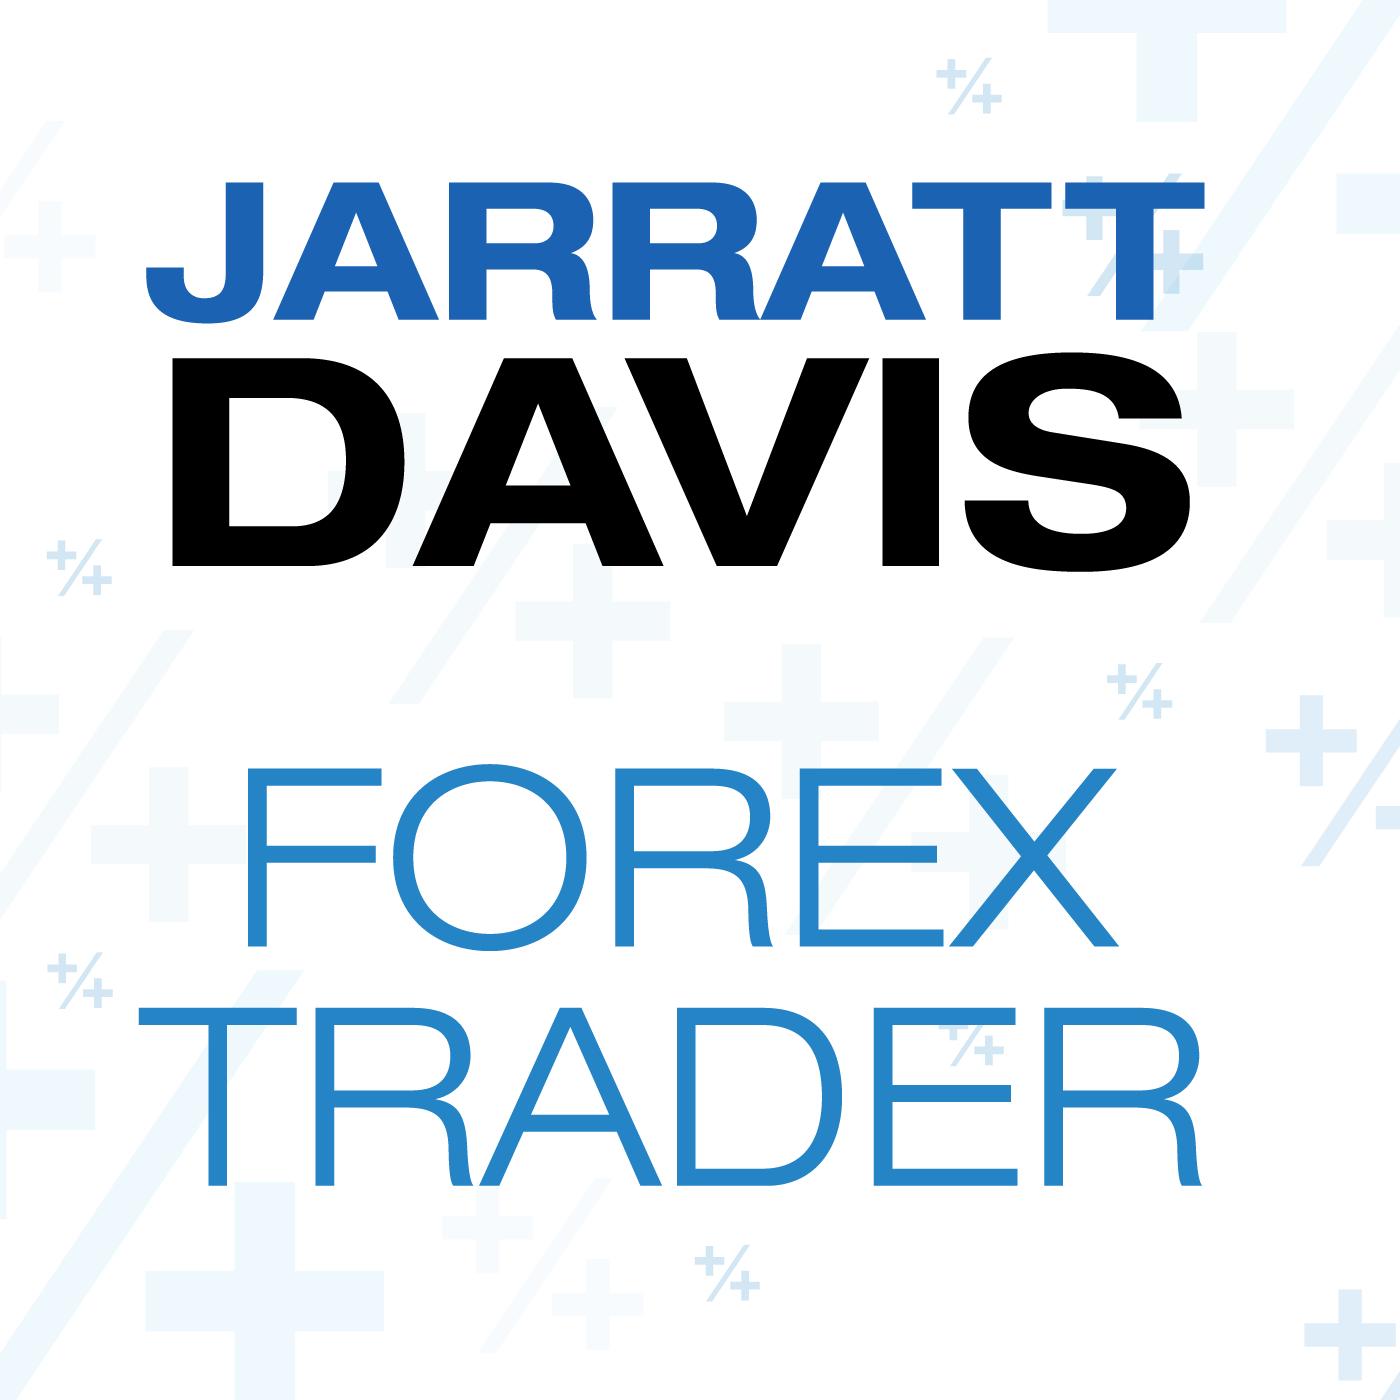 <![CDATA[Jarratt Davis Forex Trader]]>